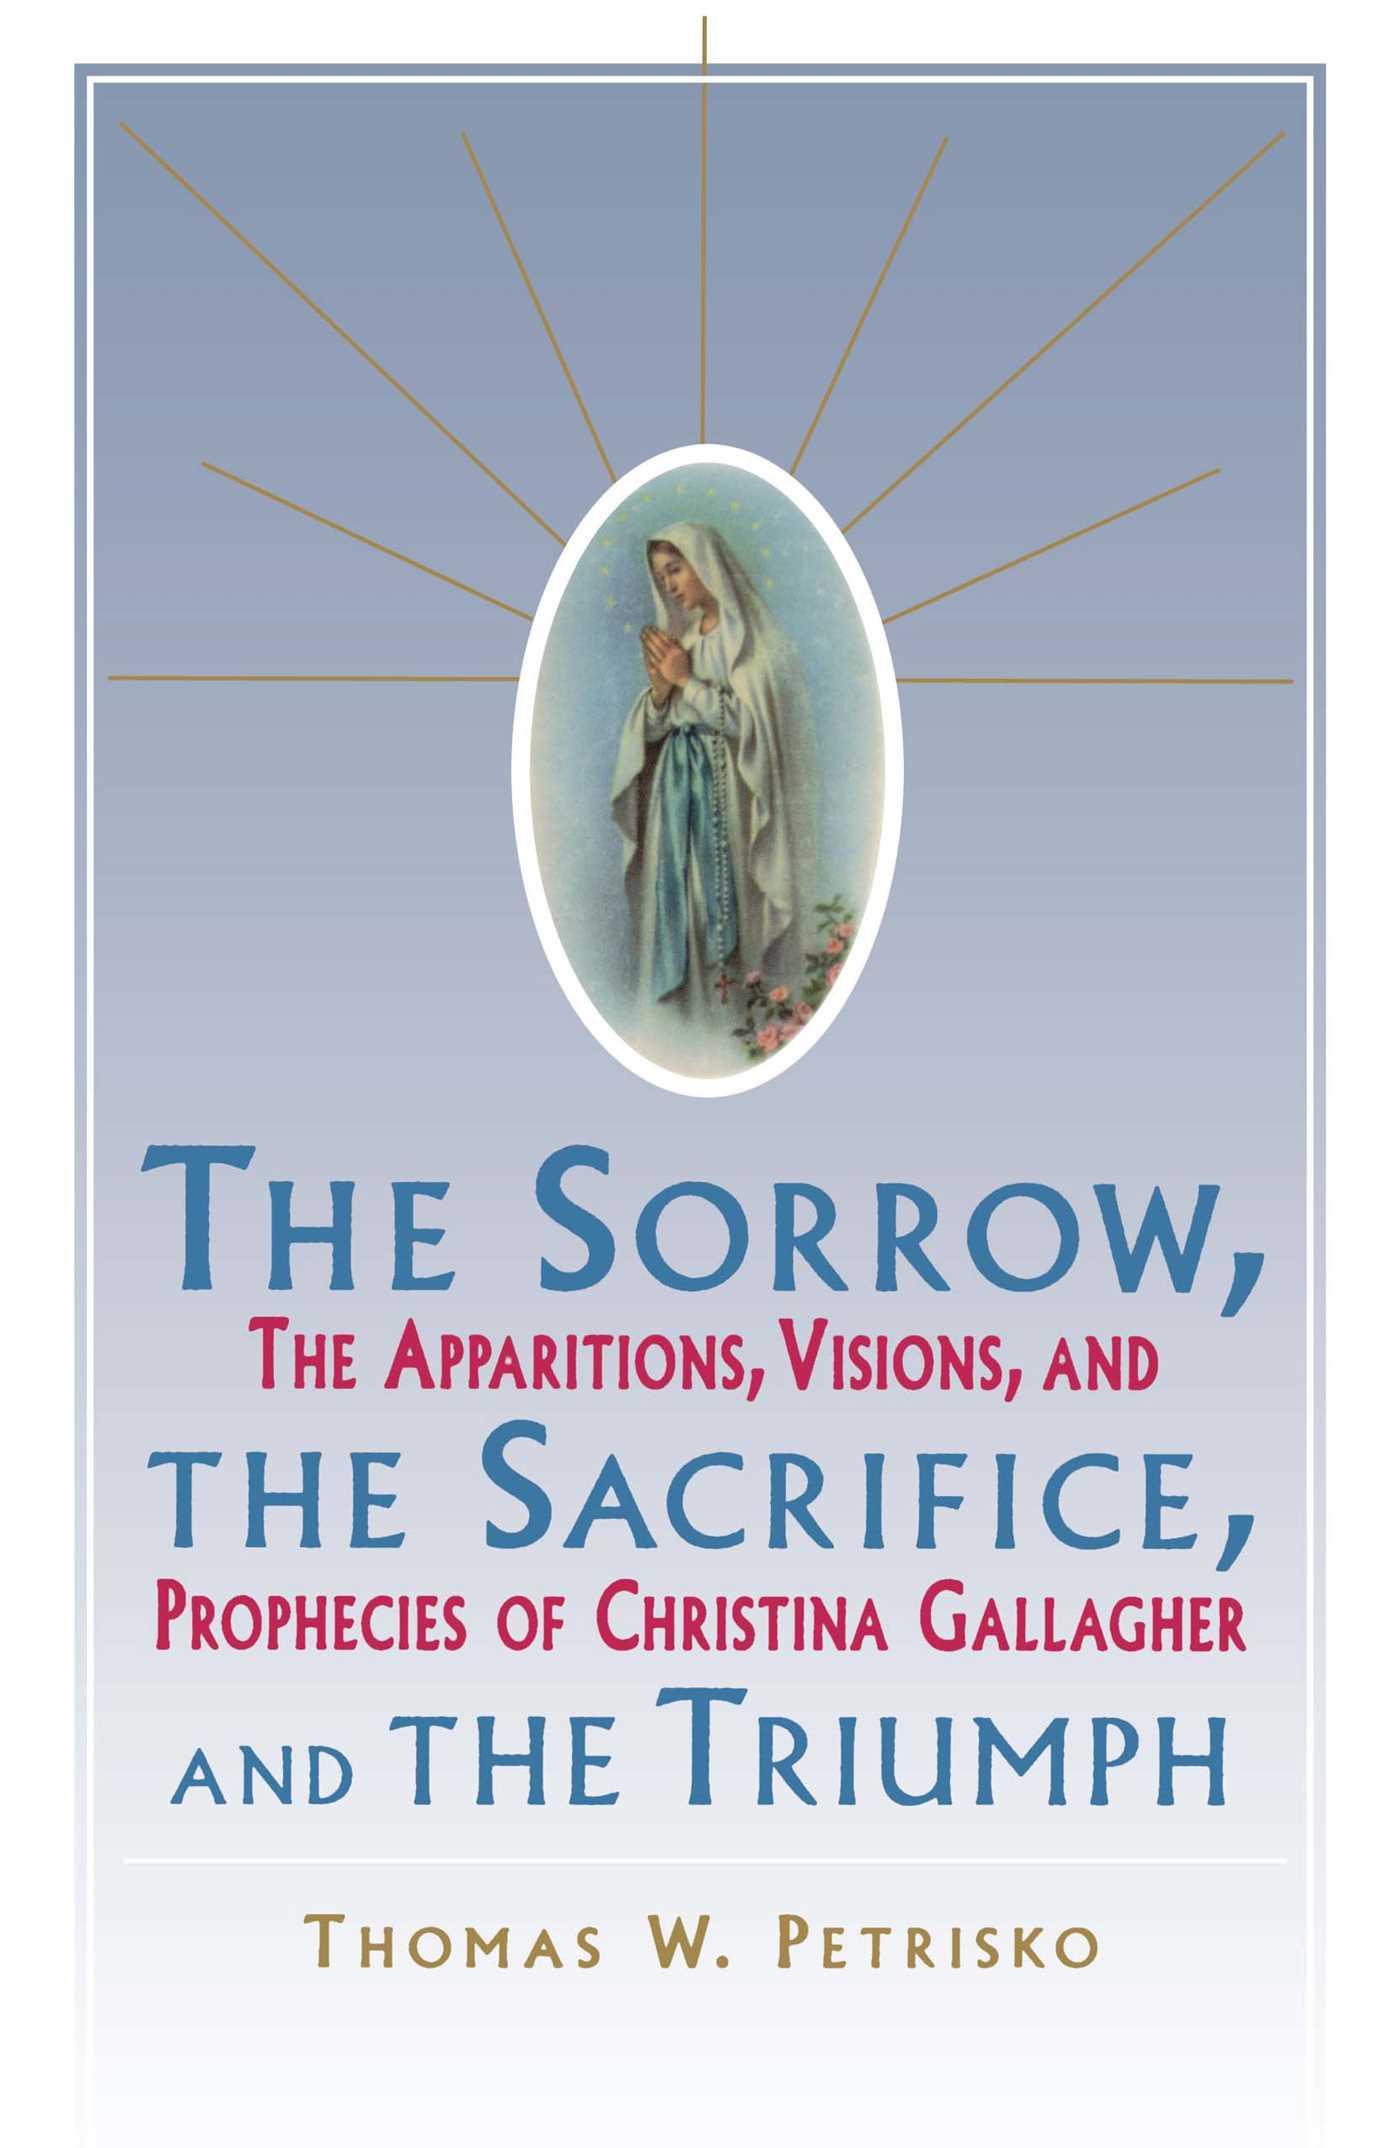 Sorrow the sacrifice and the triumph 9780684803883 hr